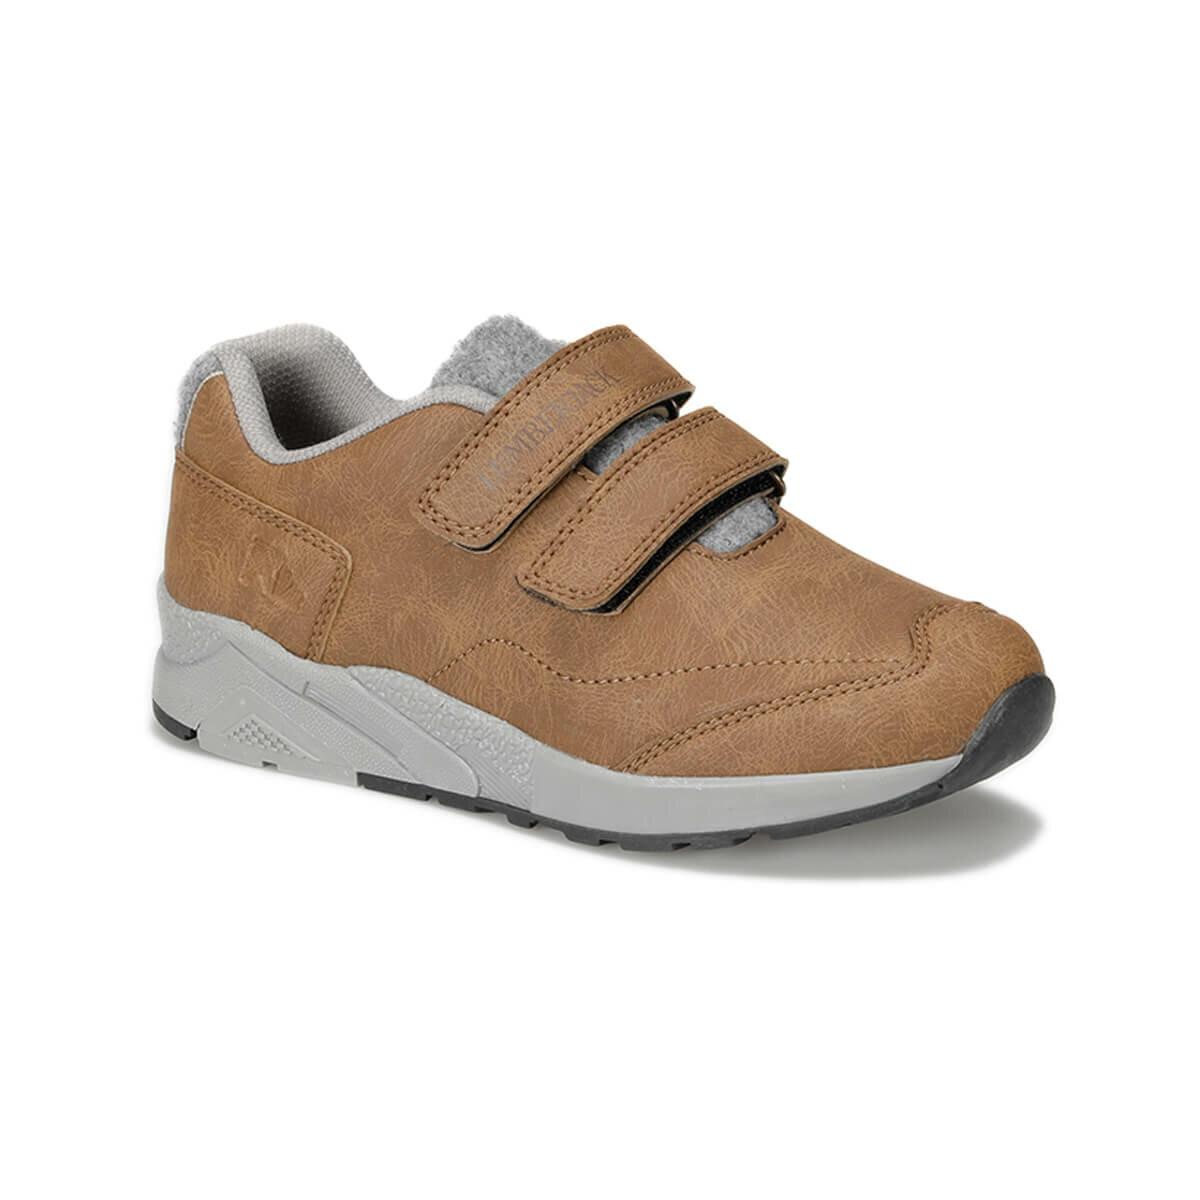 FLO BAER 9PR Tan Male Child Hiking Shoes LUMBERJACK